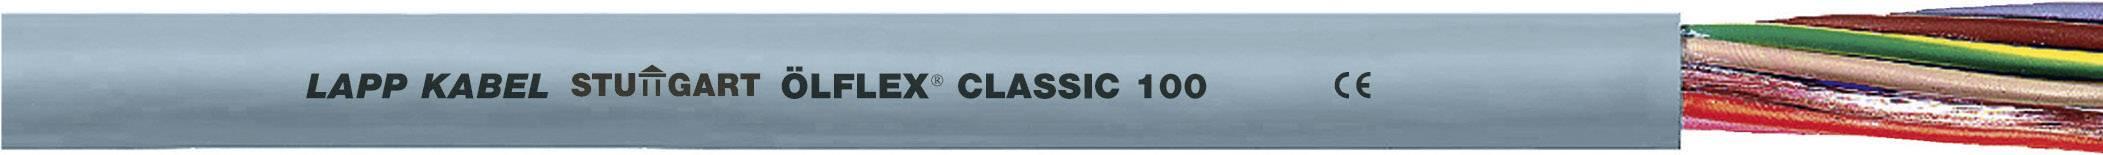 Kabel LappKabel Ölflex CLASSIC 100 7G4 (0010103), PVC, 15,2 mm, 750 V, šedá, 1000 m